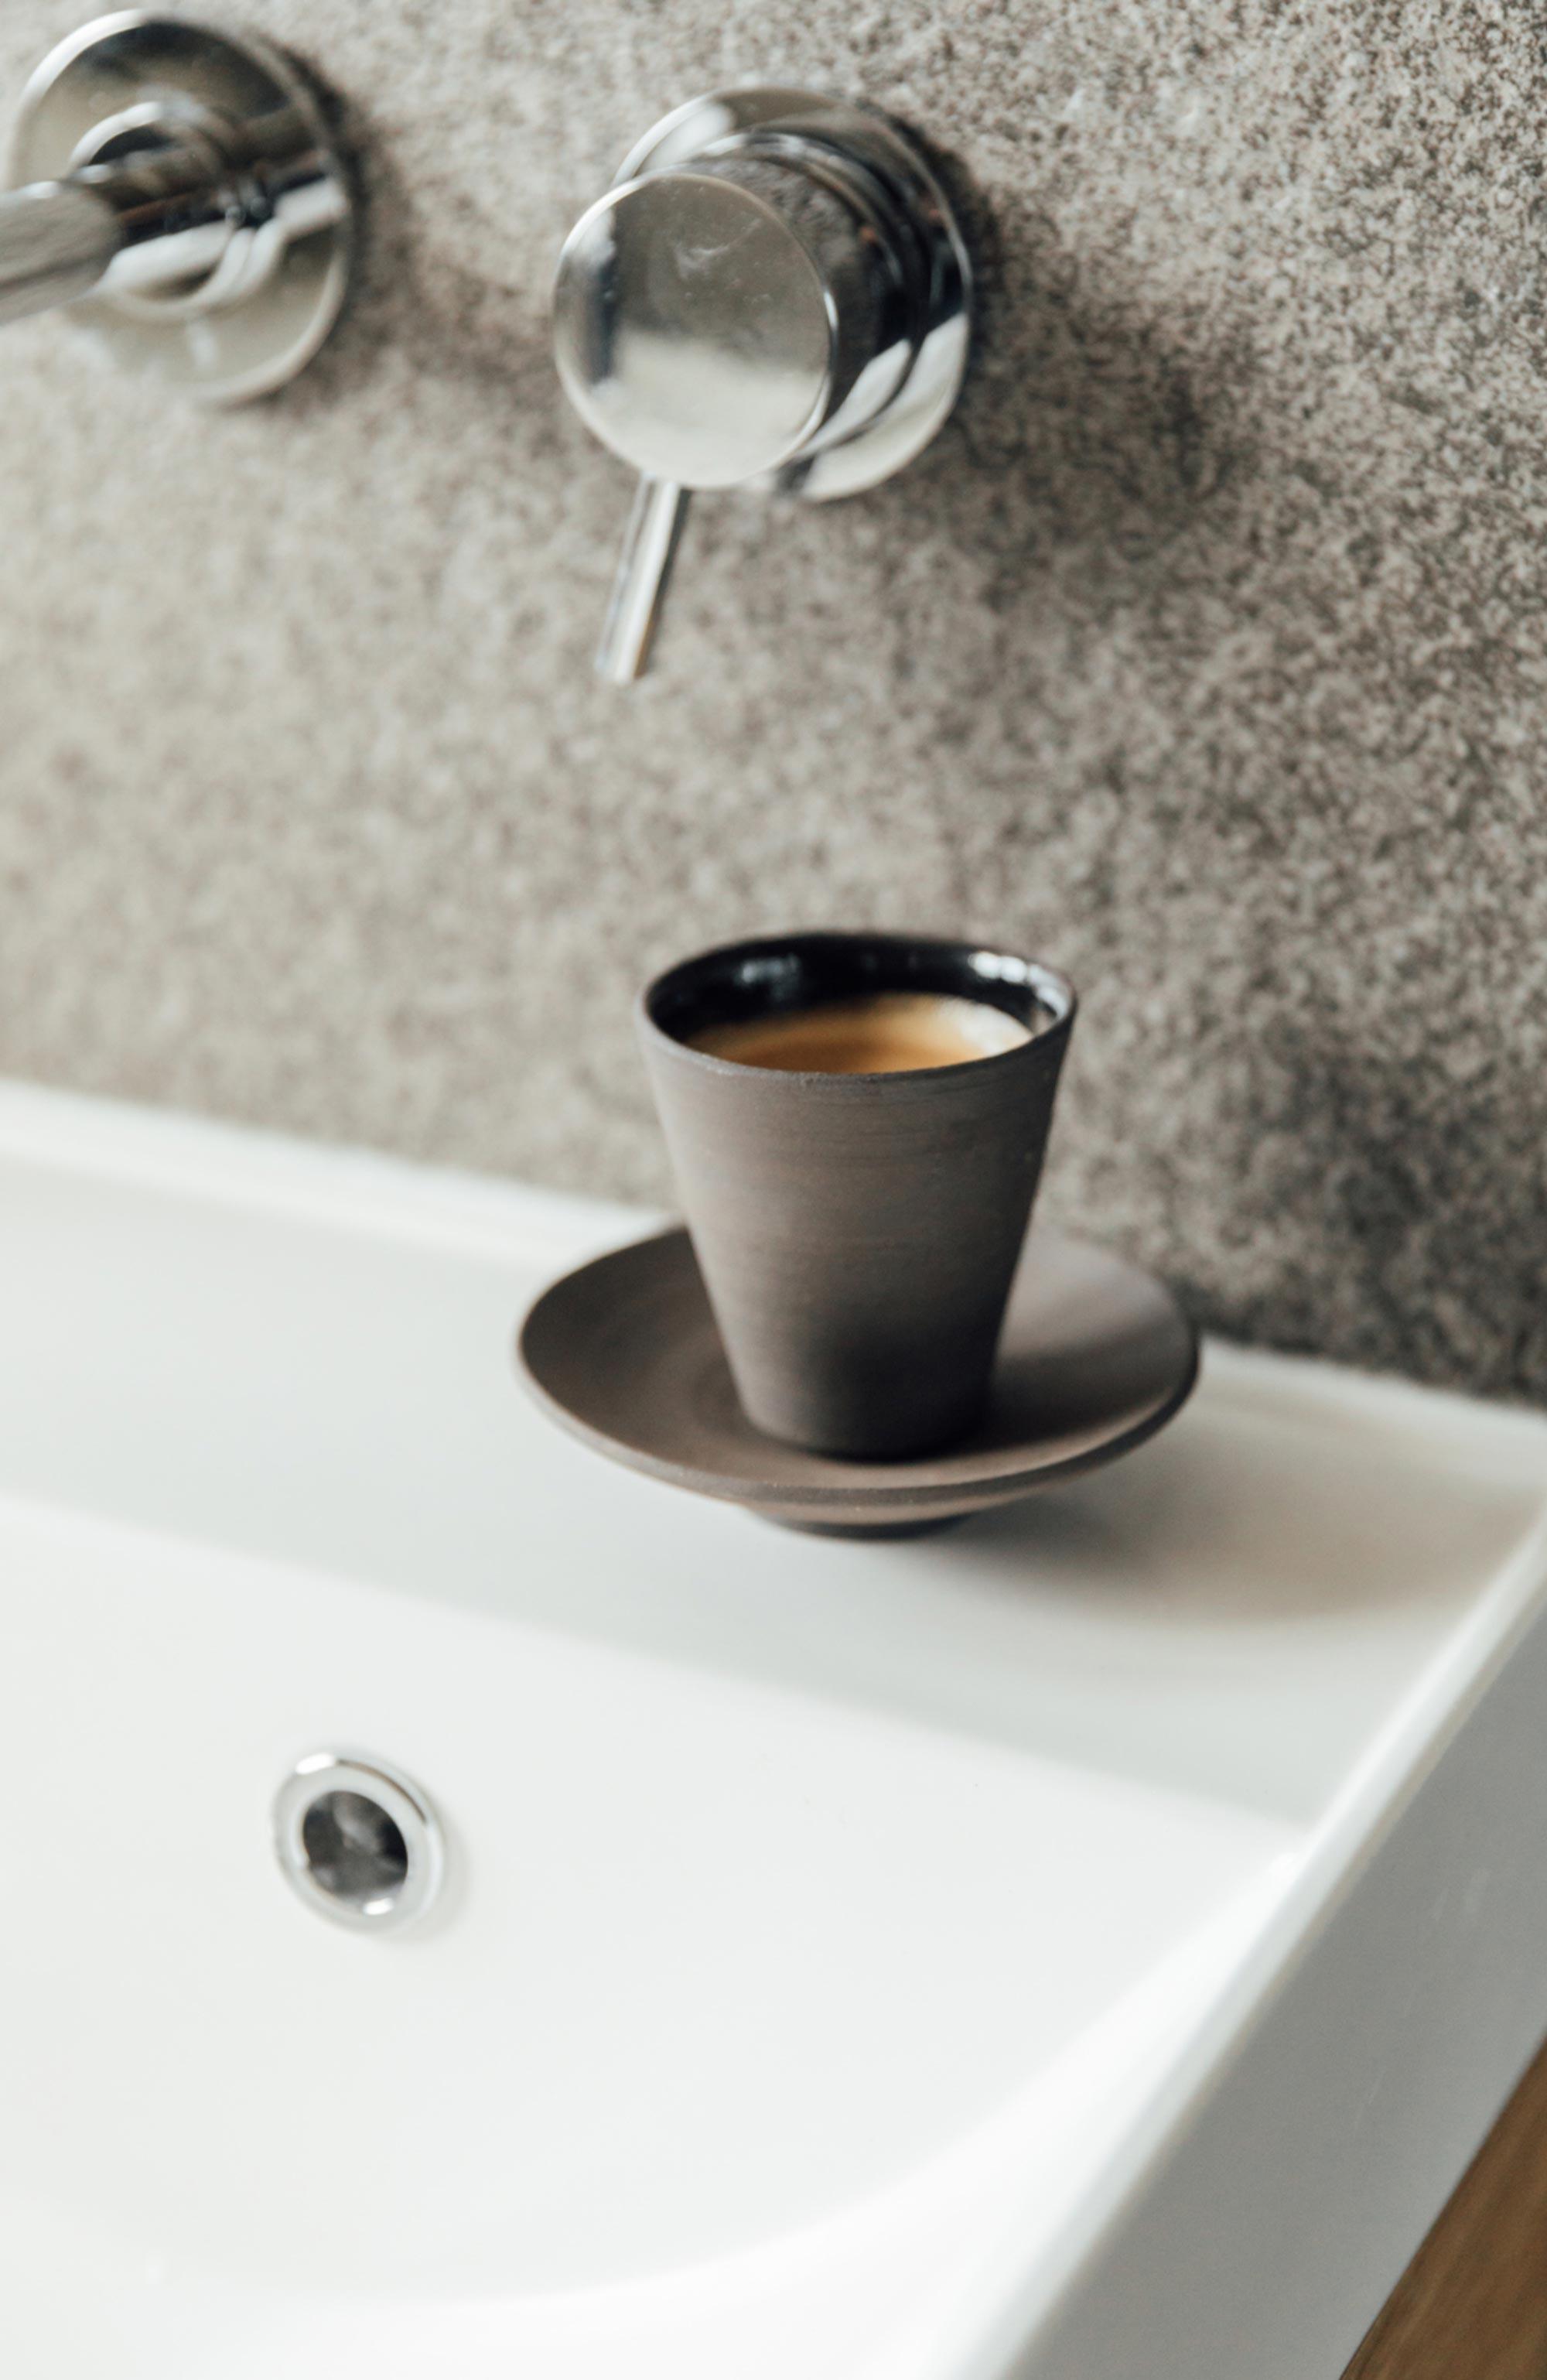 8 morning-coffee-in-the-bathroom.jpg